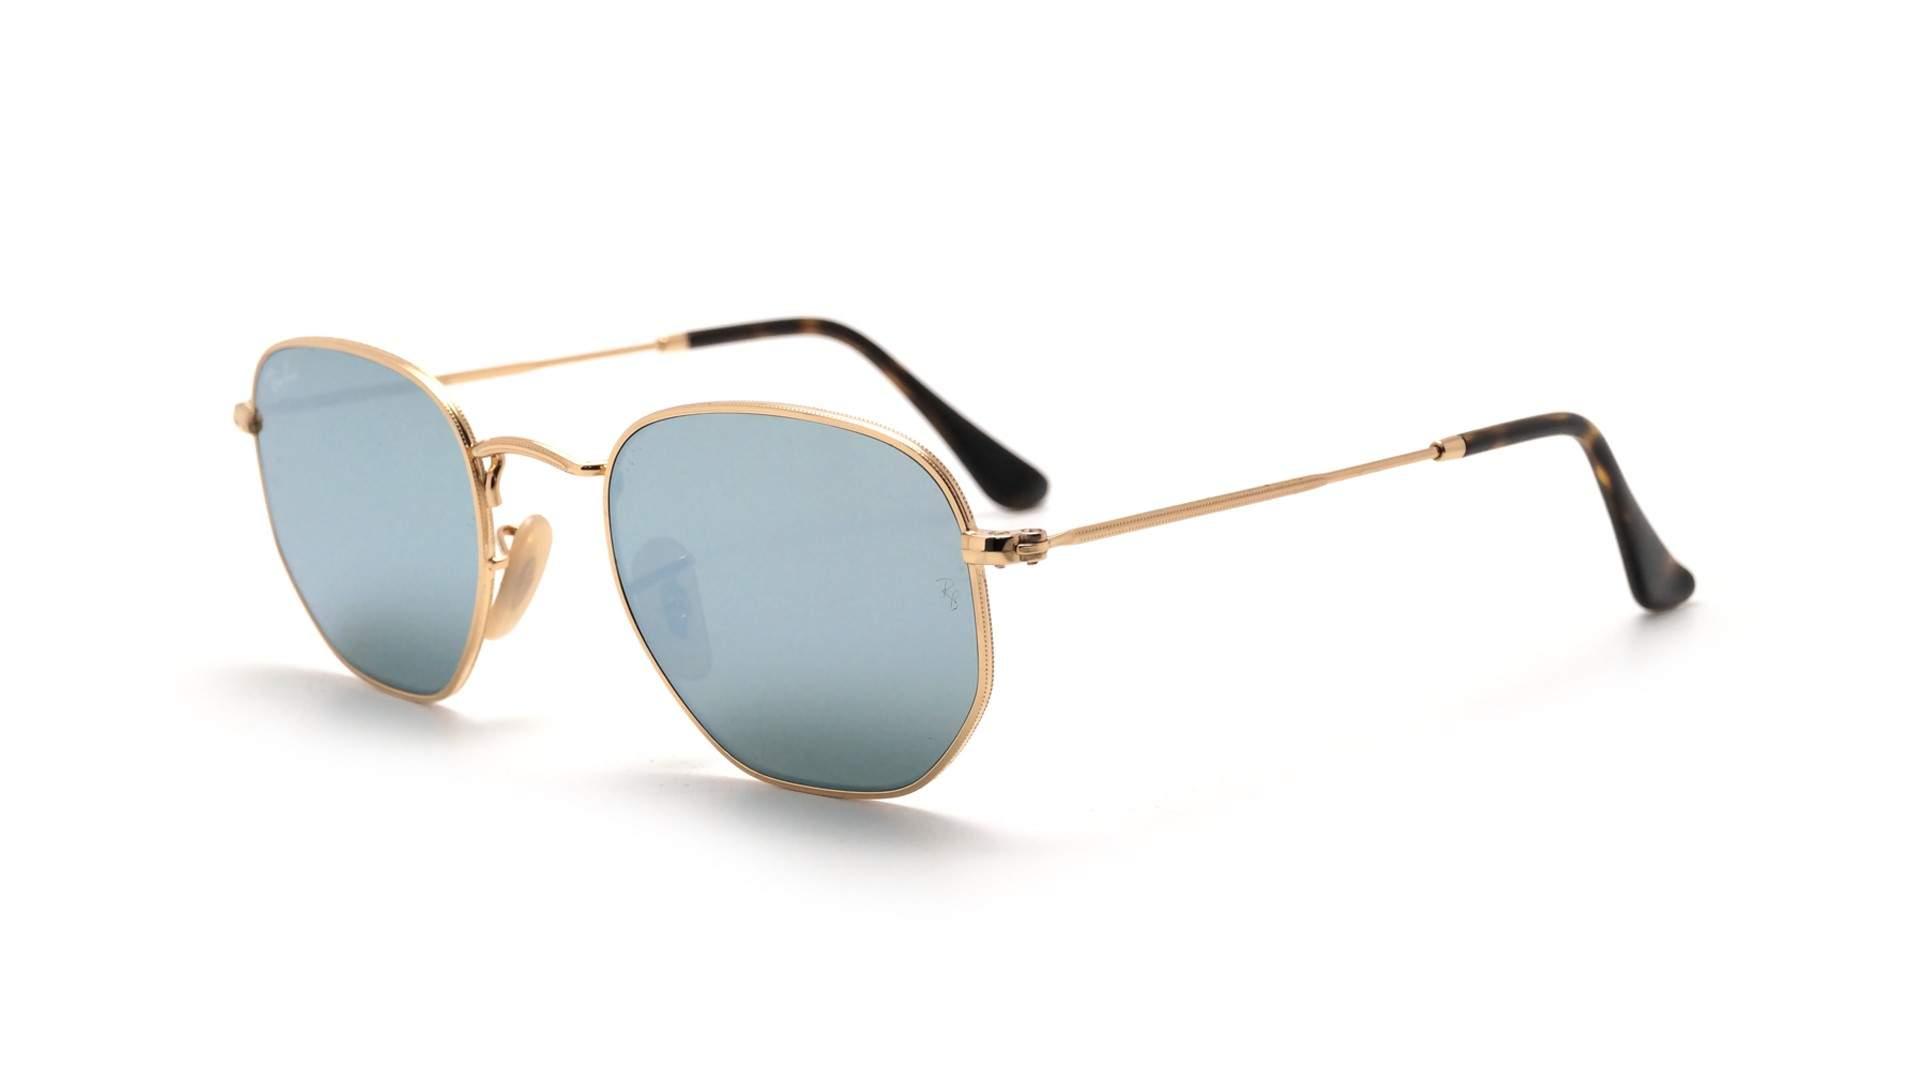 3b3086468c37b Sunglasses Ray-Ban Hexagonal Flat Lenses Gold RB3548N 001 30 51-21 Medium  Flash